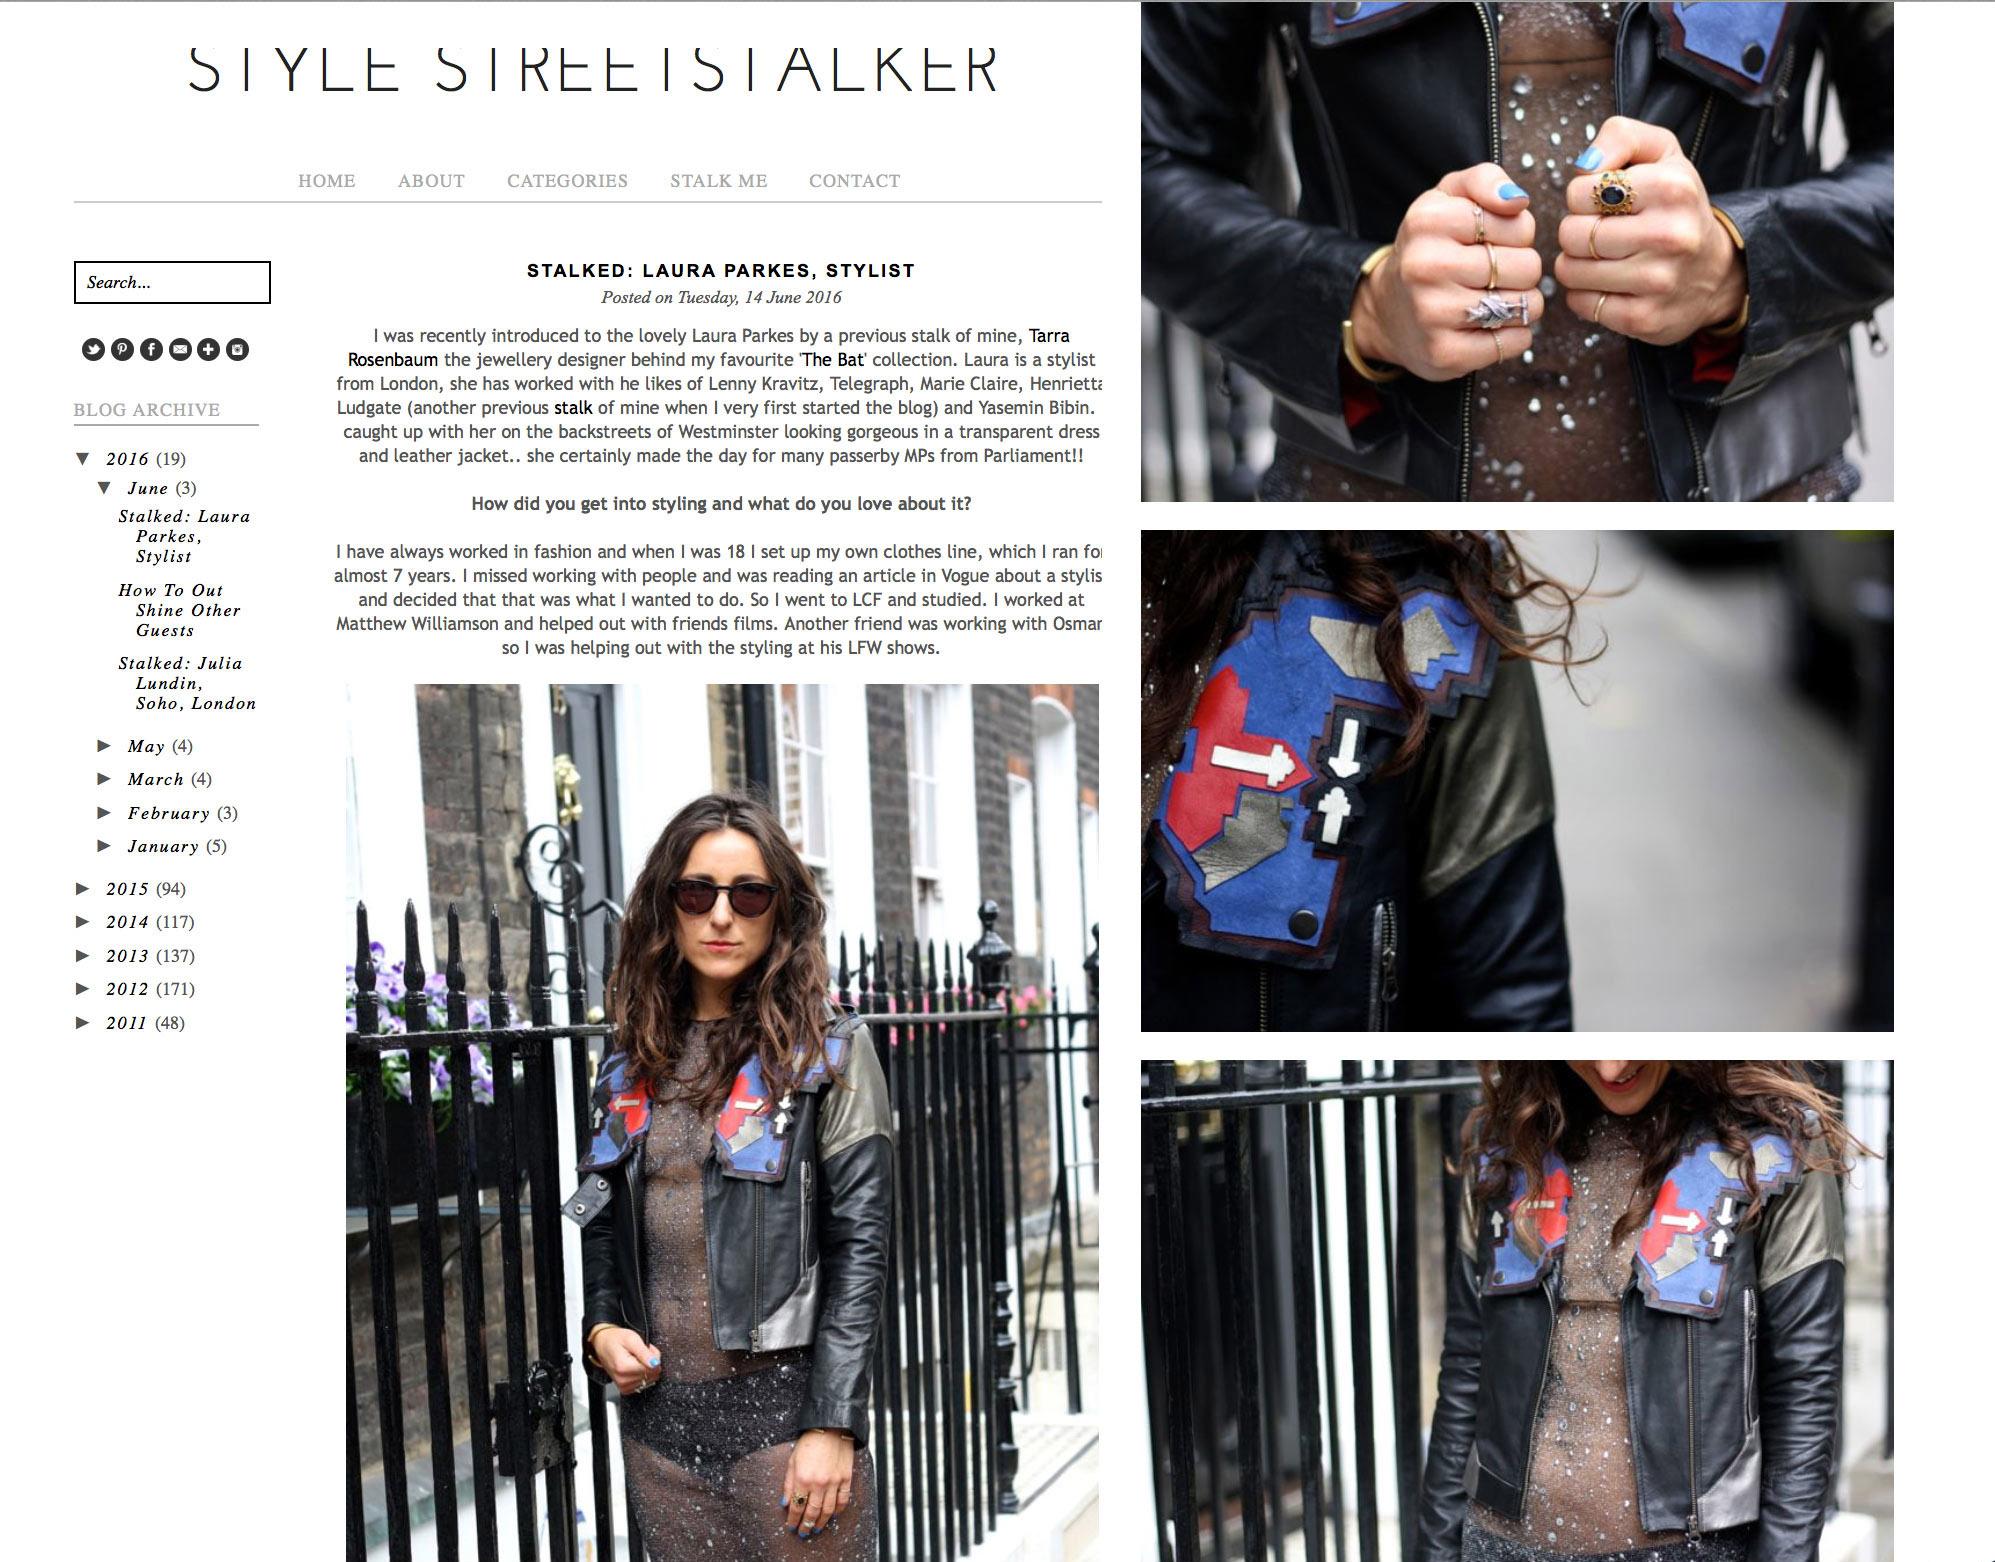 Laura-Parkes-Street-style-stalker.jpg